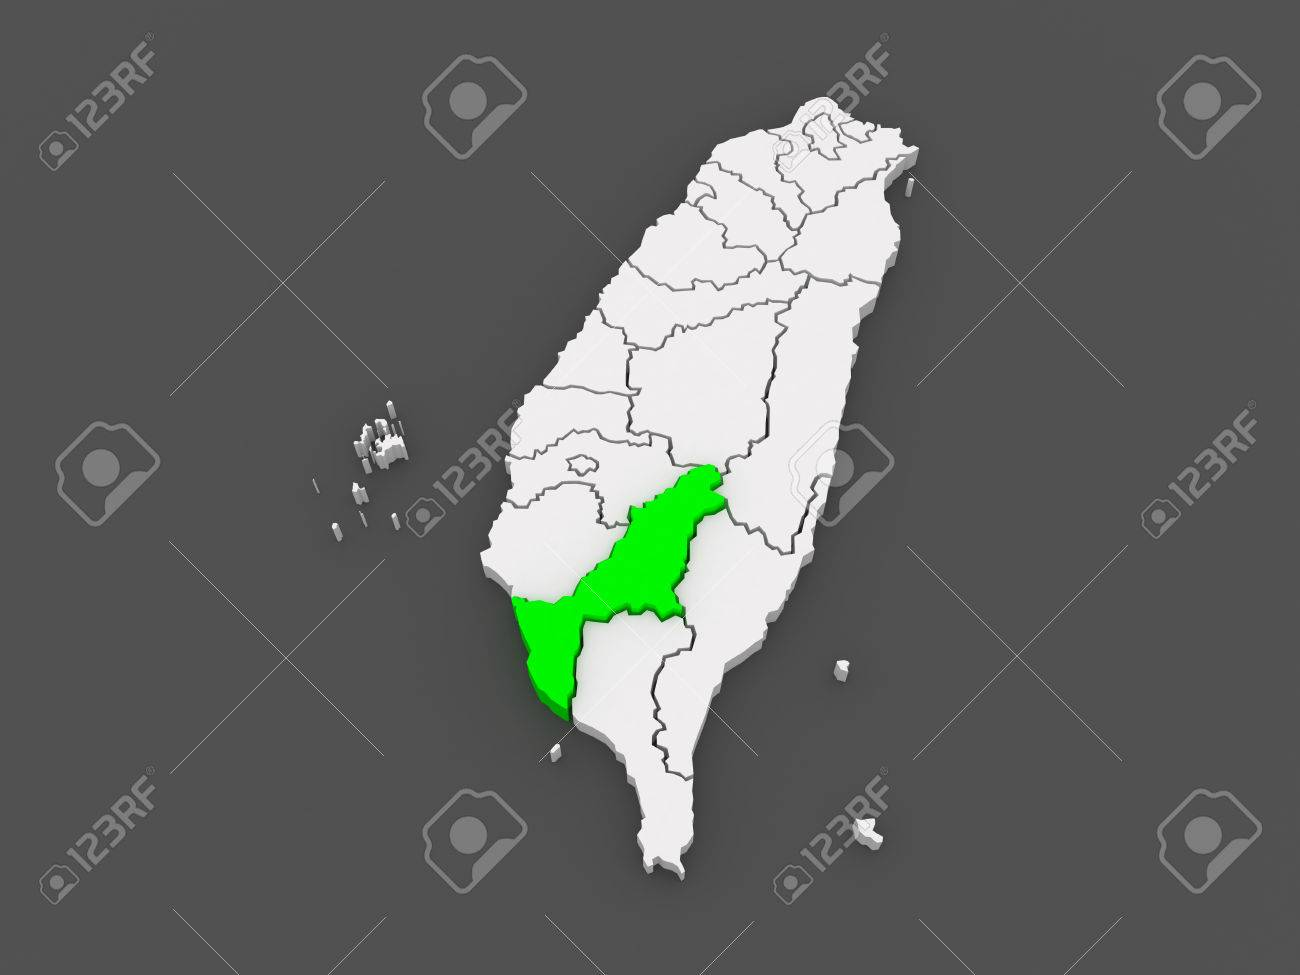 Map of Kaohsiung City. Taiwan. 3d Kaohsiung Taiwan World Map on taipei attractions map, chiayi taiwan map, taiwan on map, monrovia liberia on a map, pingtung taiwan map, taiwan travel map, china taiwan map, taipei china map, taichung taiwan map, taoyuan taiwan map, manila philippines map, tainan taiwan map, taiwan island map, taiwan tourism map, taipei taiwan map, taiwan night markets map, macau taiwan map, asia taiwan map, taipei international airport terminal map, seattle taiwan map,